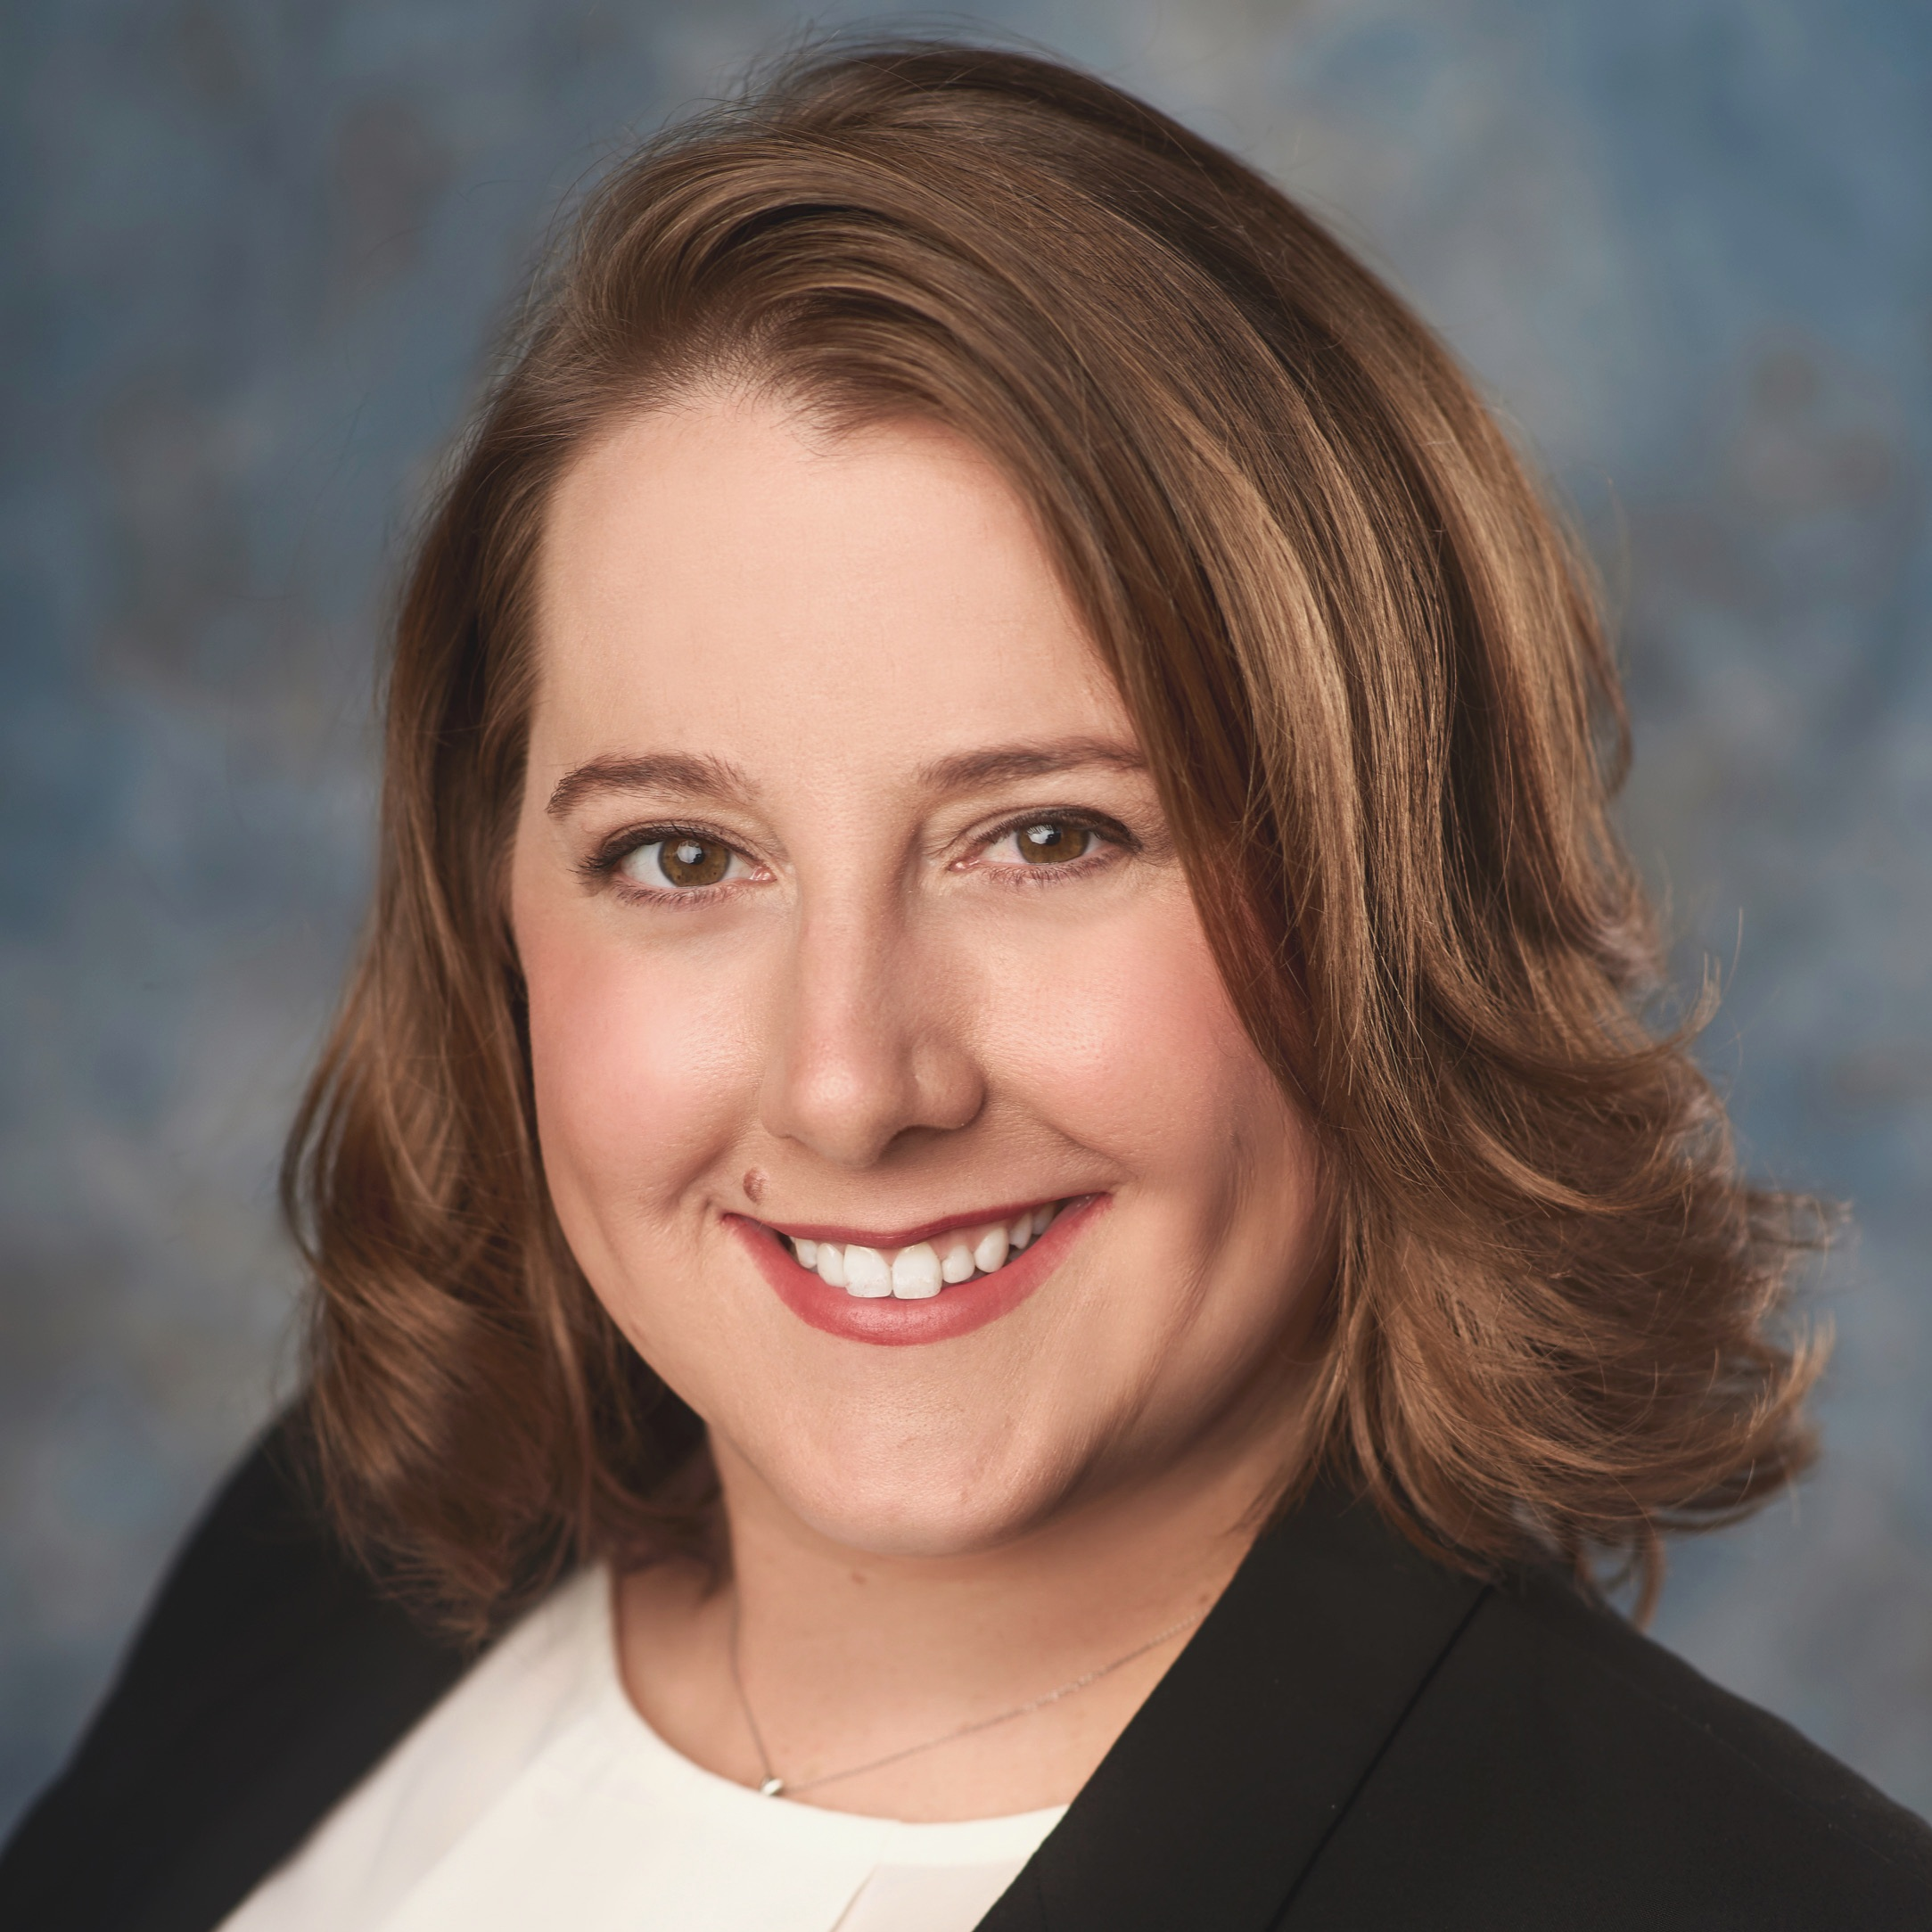 Lauren Goff Environmental Service Group Leader